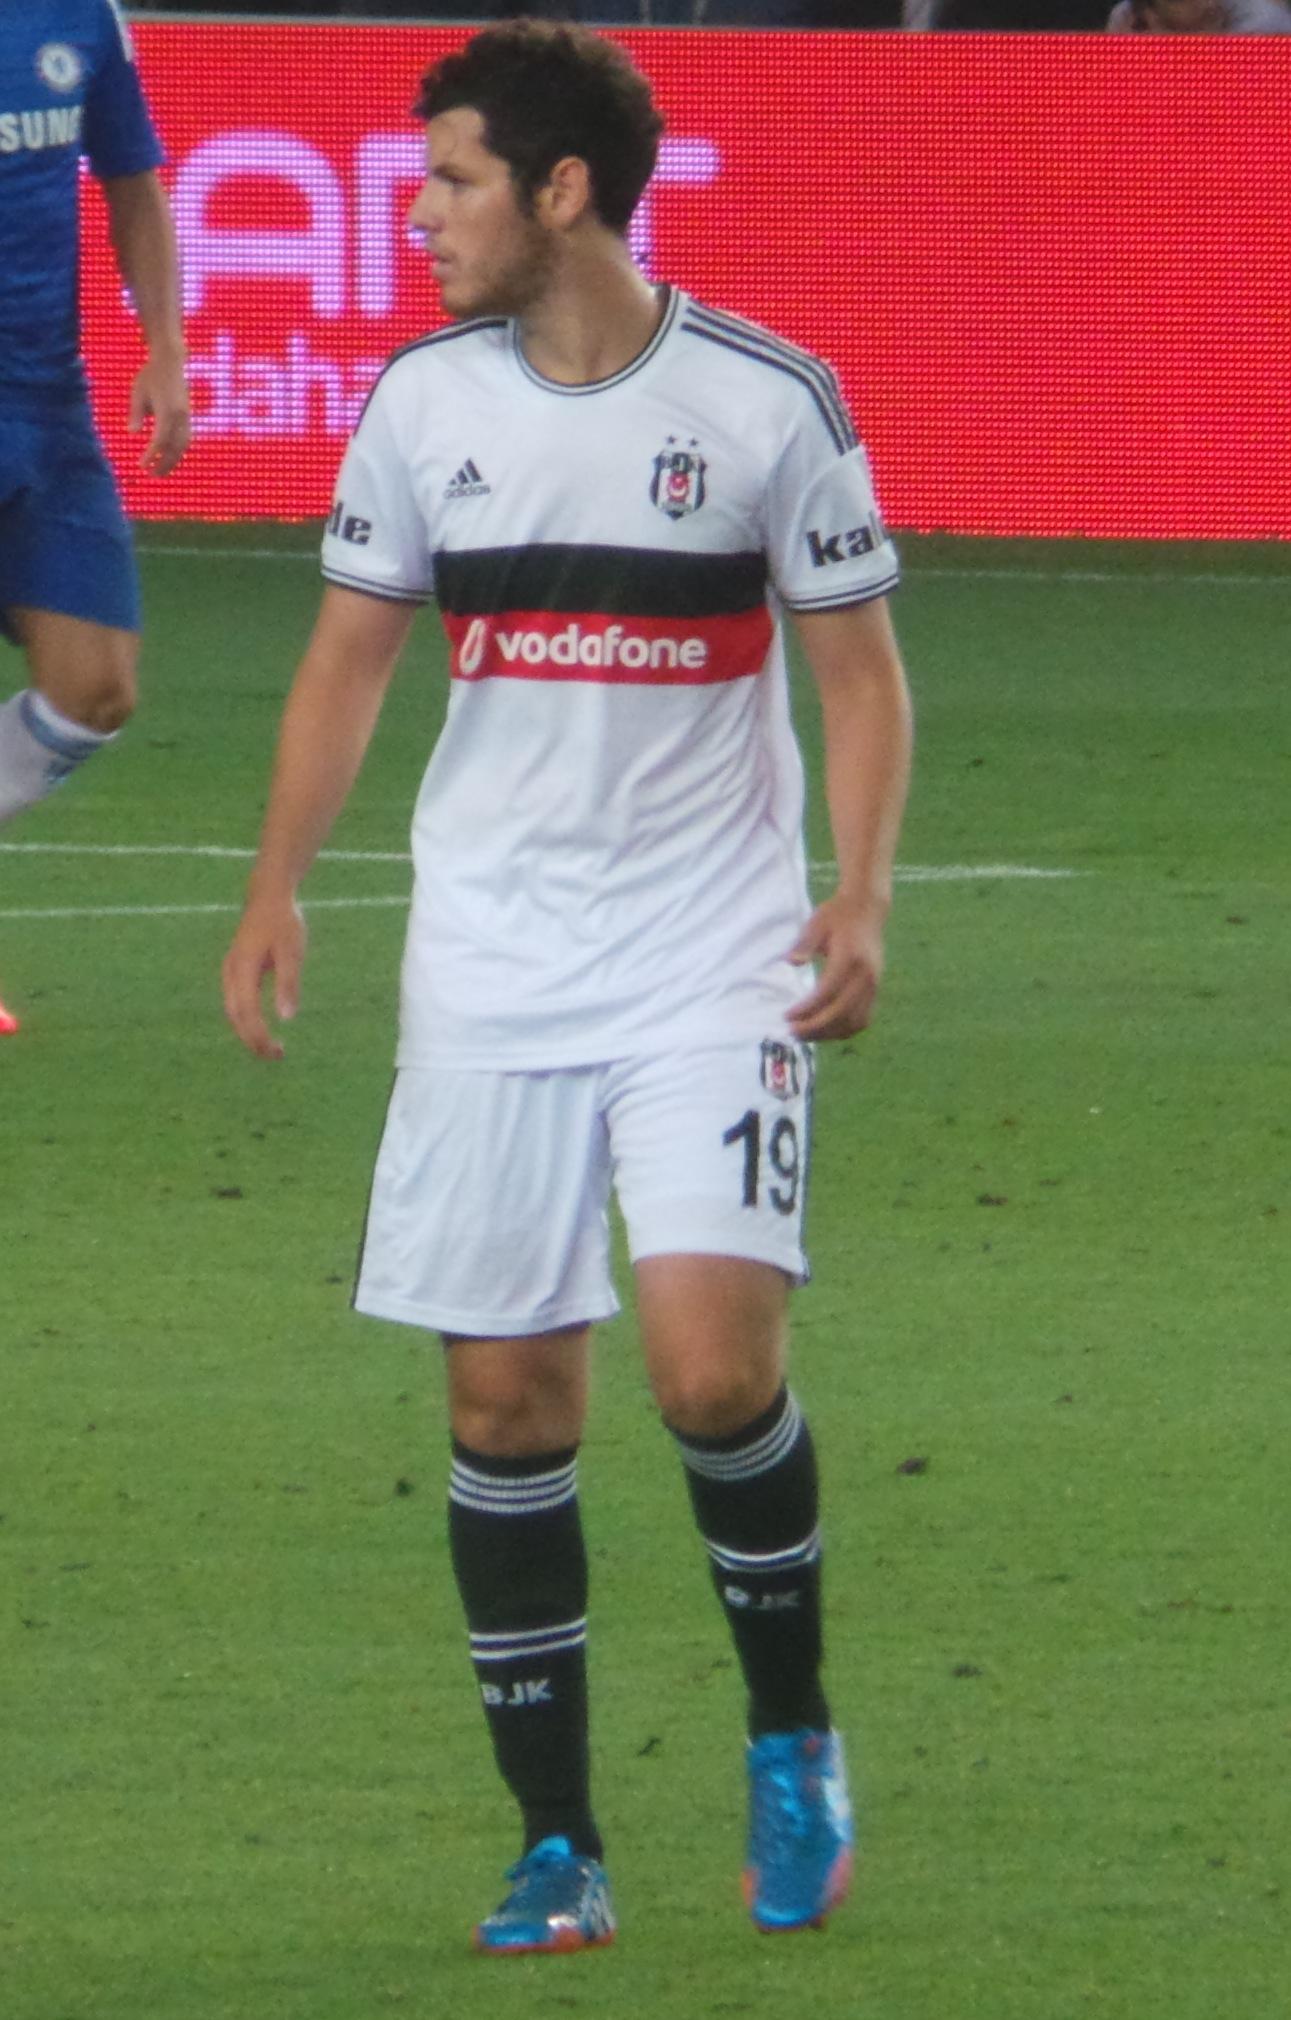 Franco playing for [[Beşiktaş J.K.|Beşiktaş]] in 2014